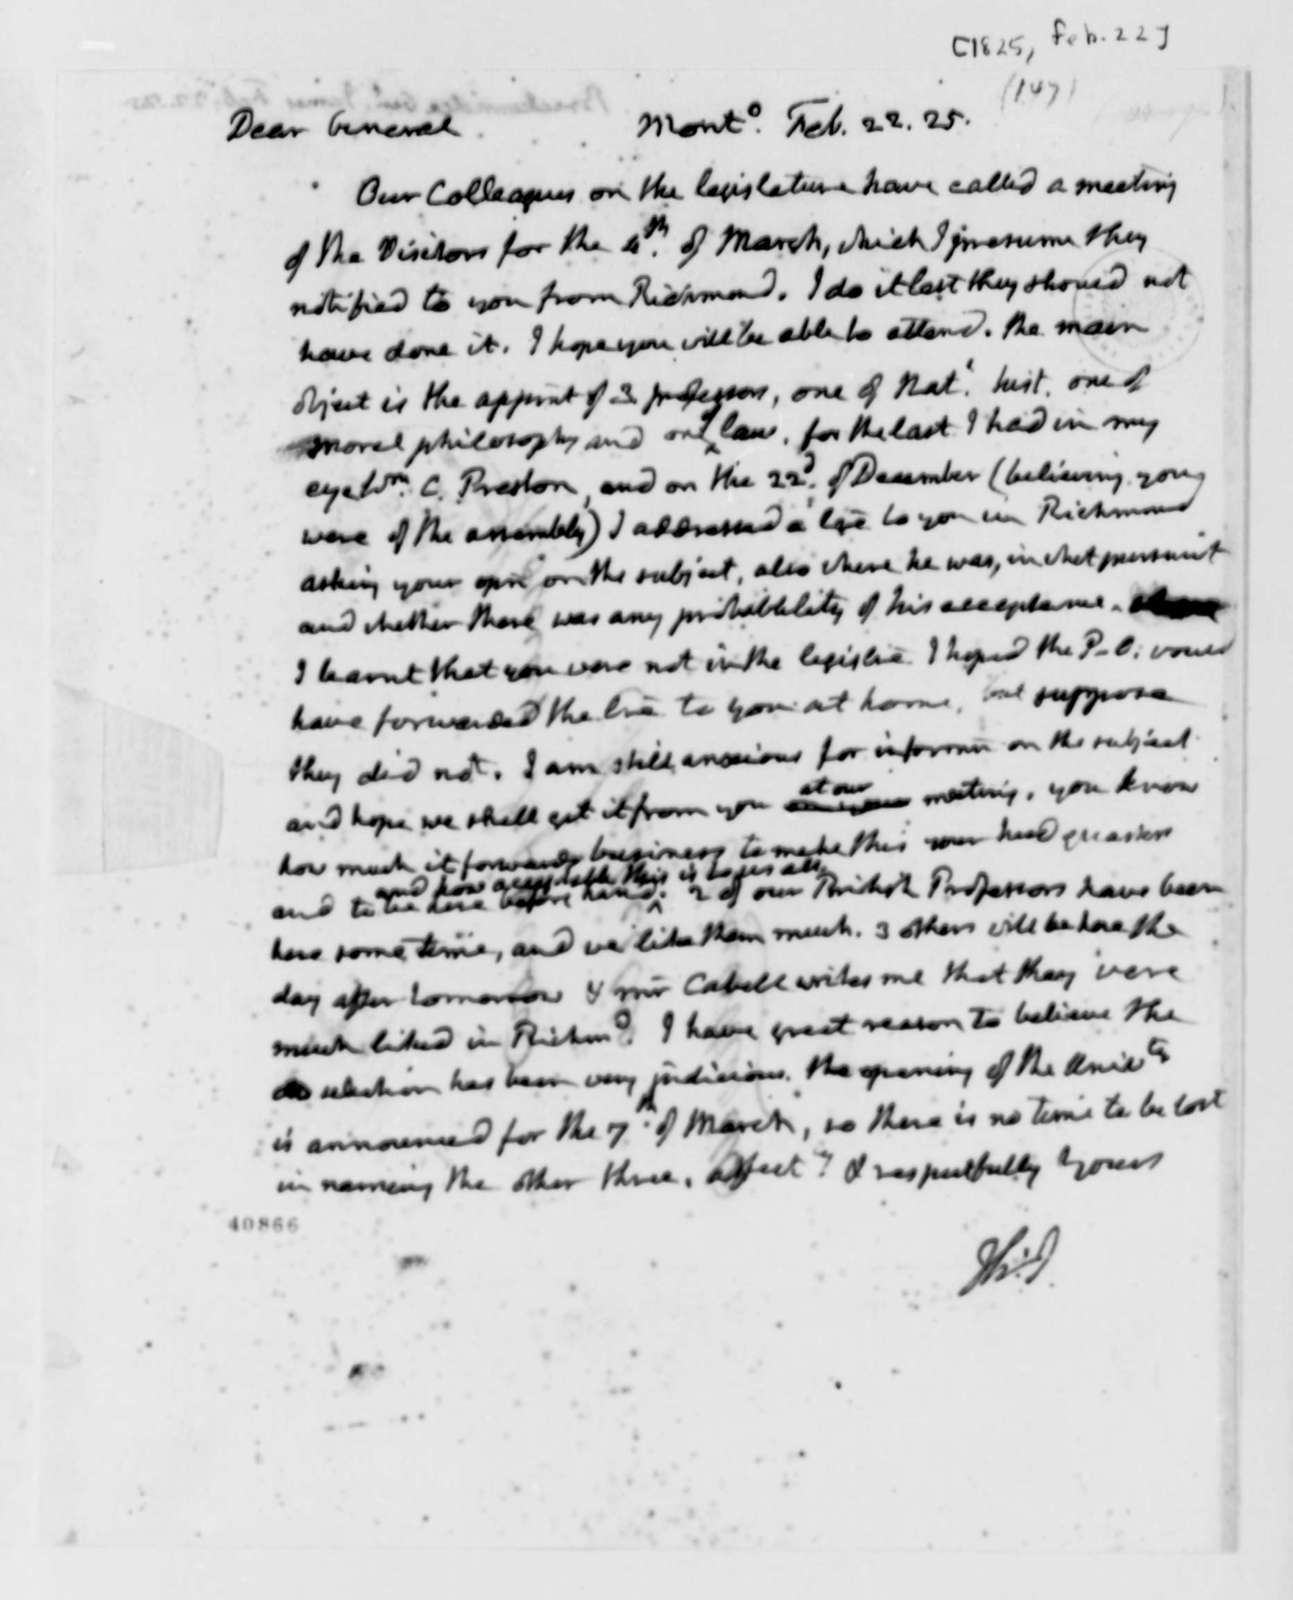 Thomas Jefferson to James Breckinridge, February 22, 1825